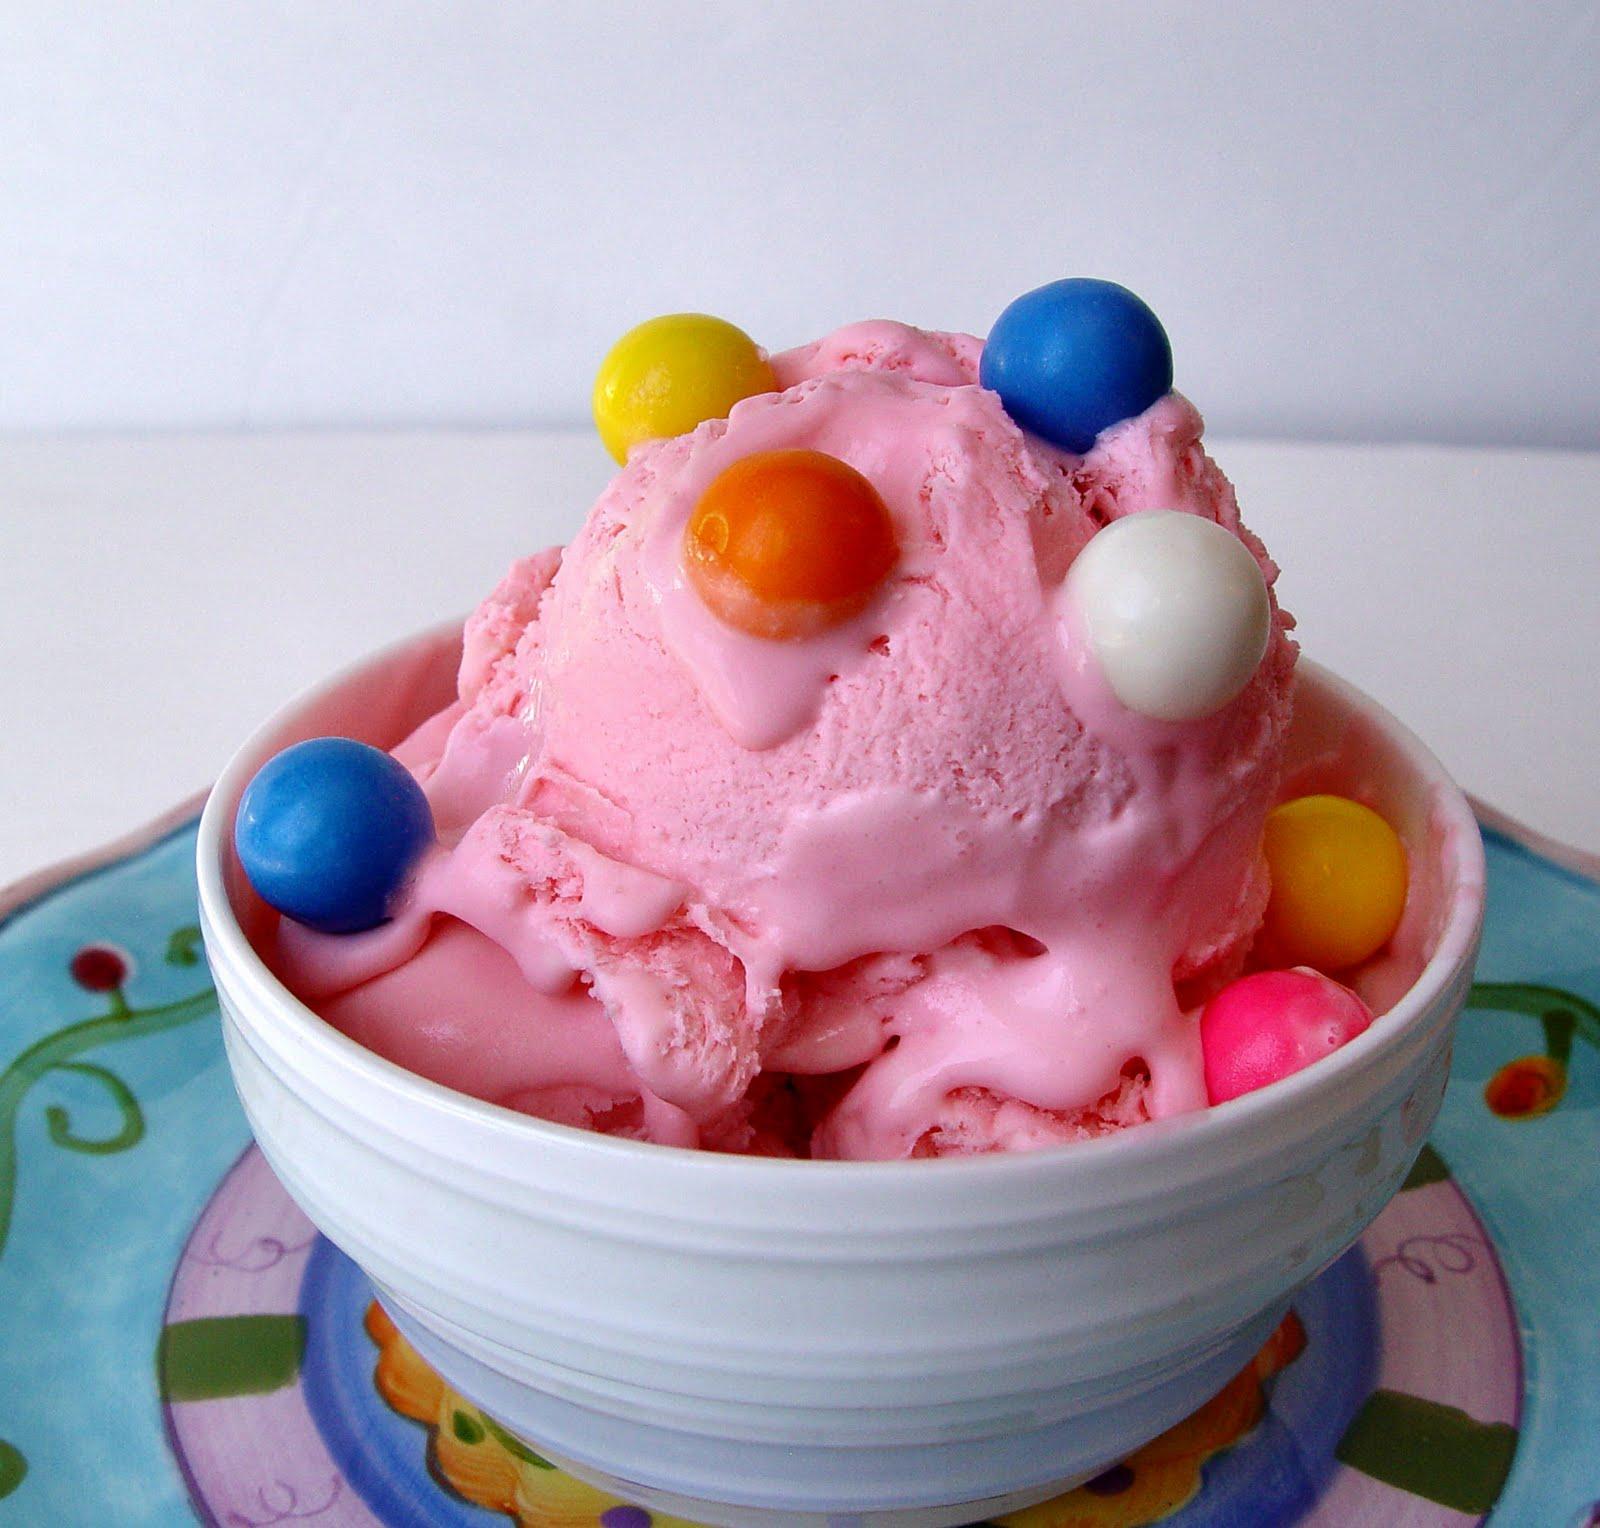 Homemade Ice Cream. No Ice Cream Machine Needed!